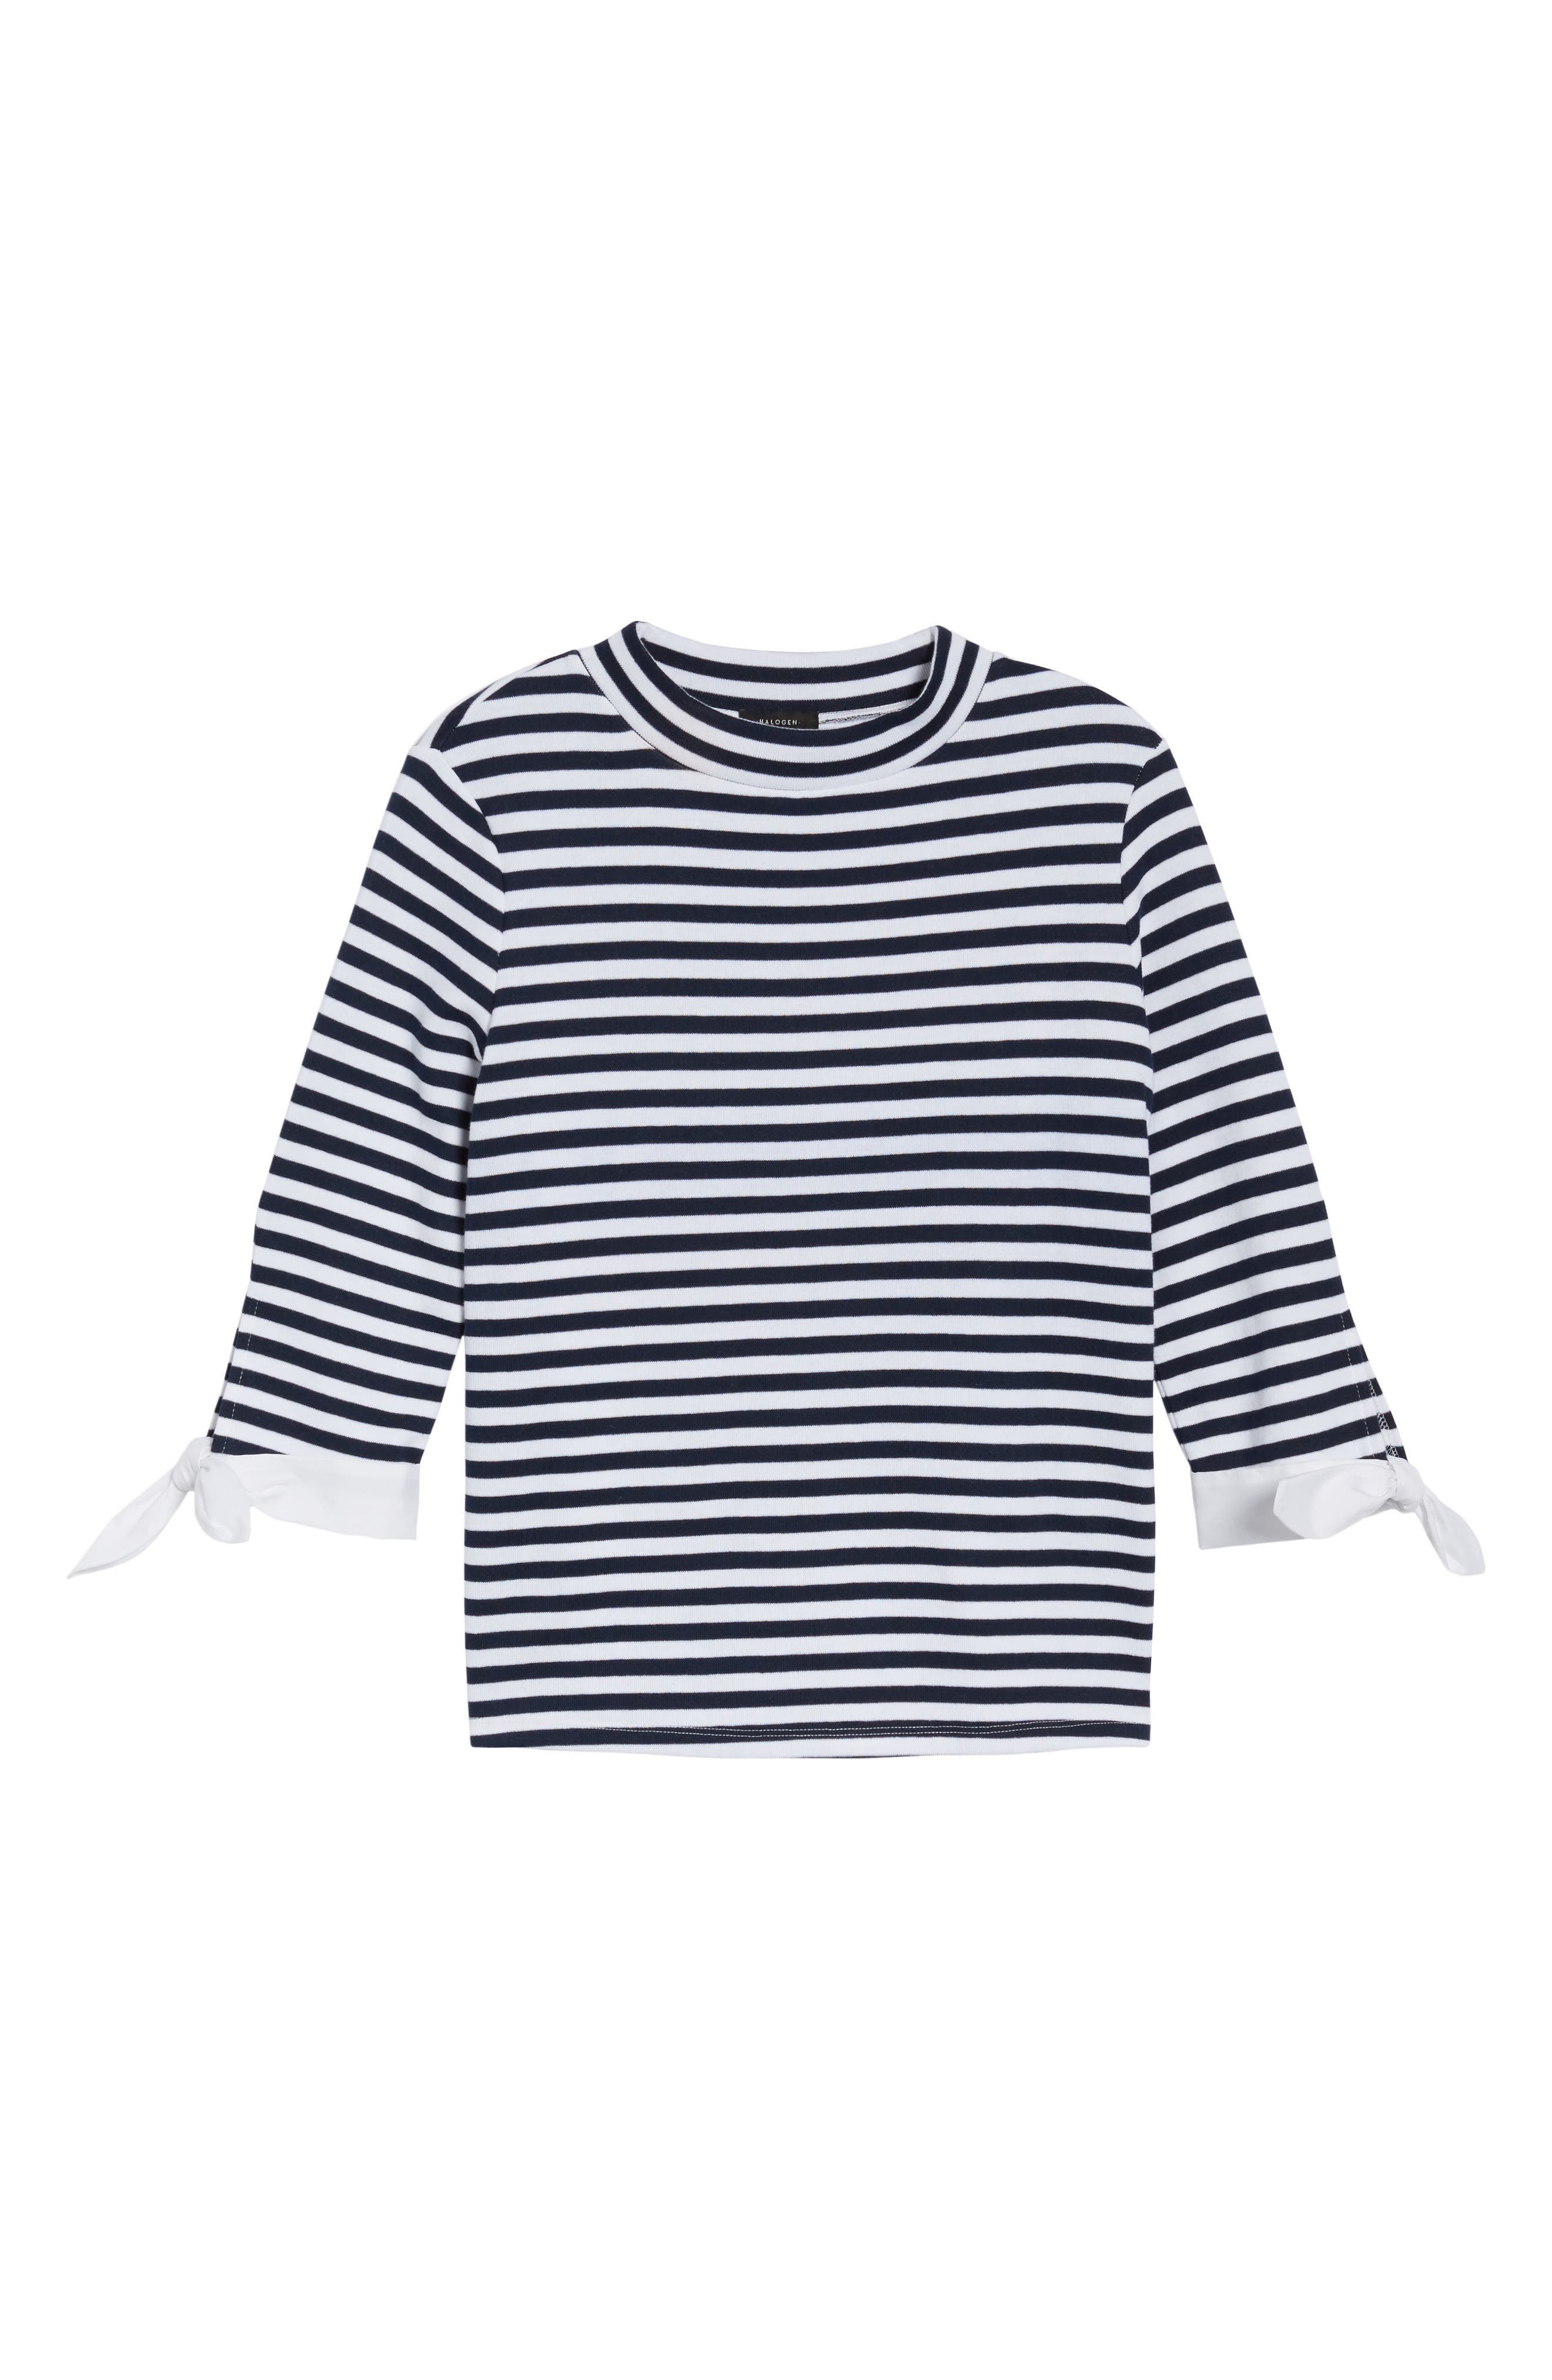 Poplin Tie Cuff Knit Top,                             Alternate thumbnail 6, color,                             Navy- White Stripe